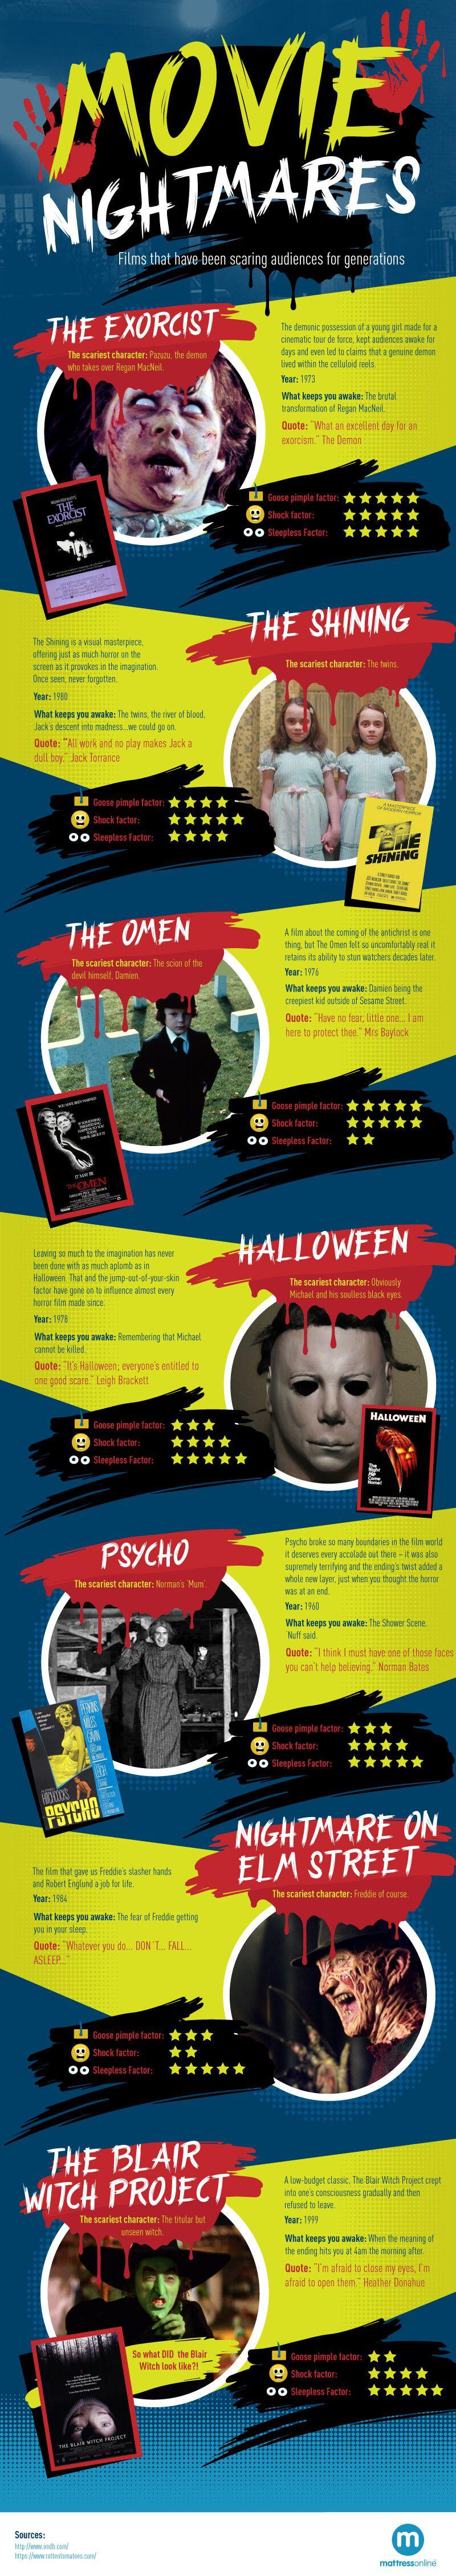 Movie Nightmares infographic